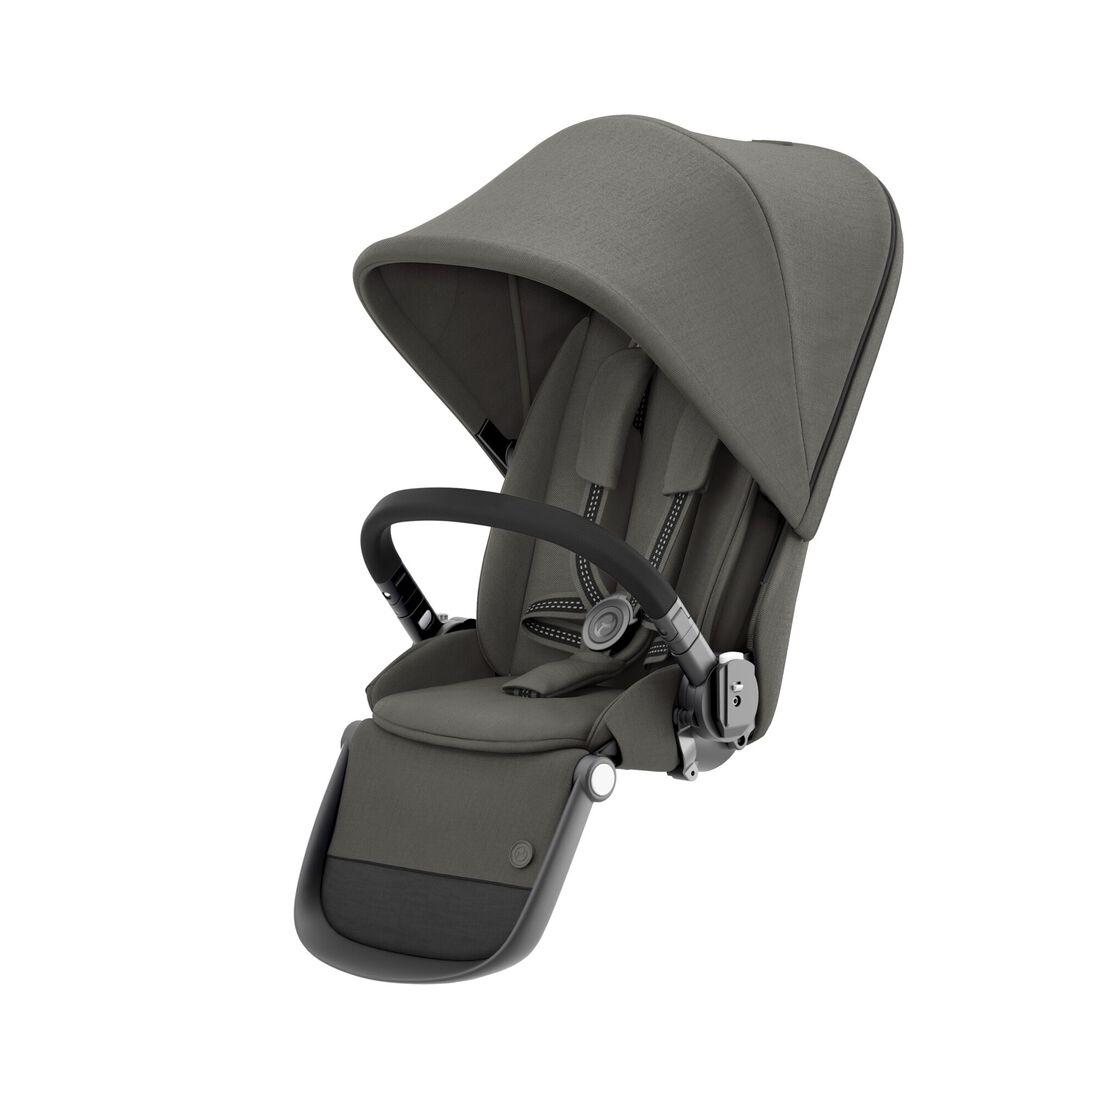 CYBEX Gazelle S Seat Unit - Soho Grey (Black Frame) in Soho Grey (Black Frame) large image number 1